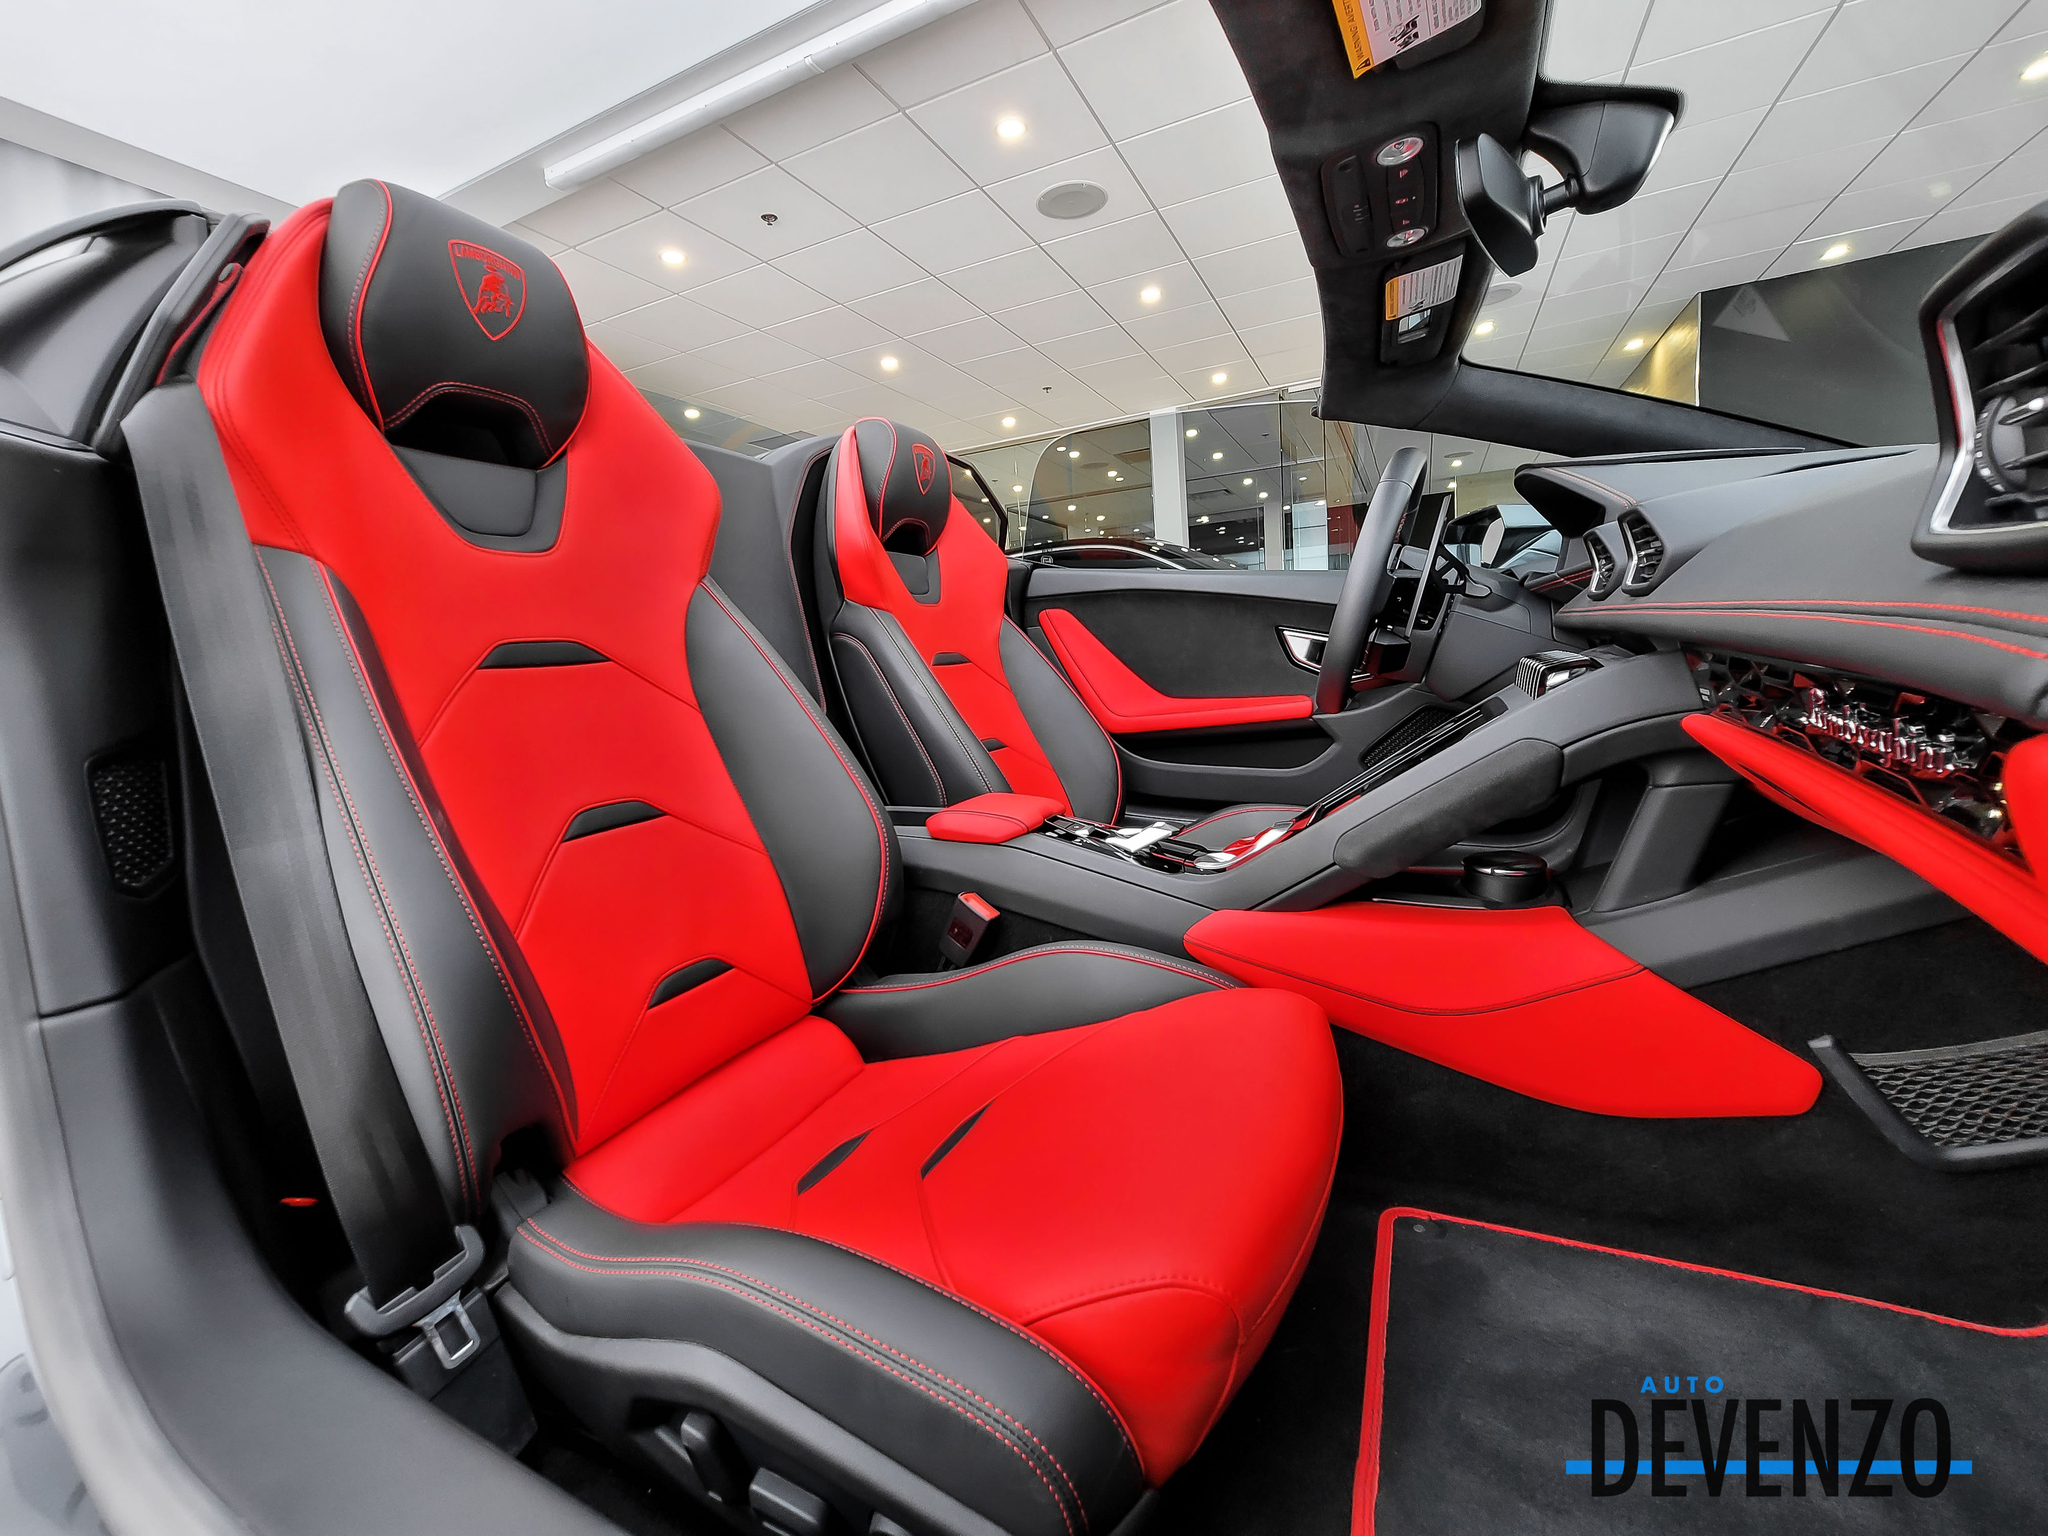 2021 Lamborghini Huracan EVO SPYDER LP610-2 602HP FULL PPF / FRONT LIFT complet